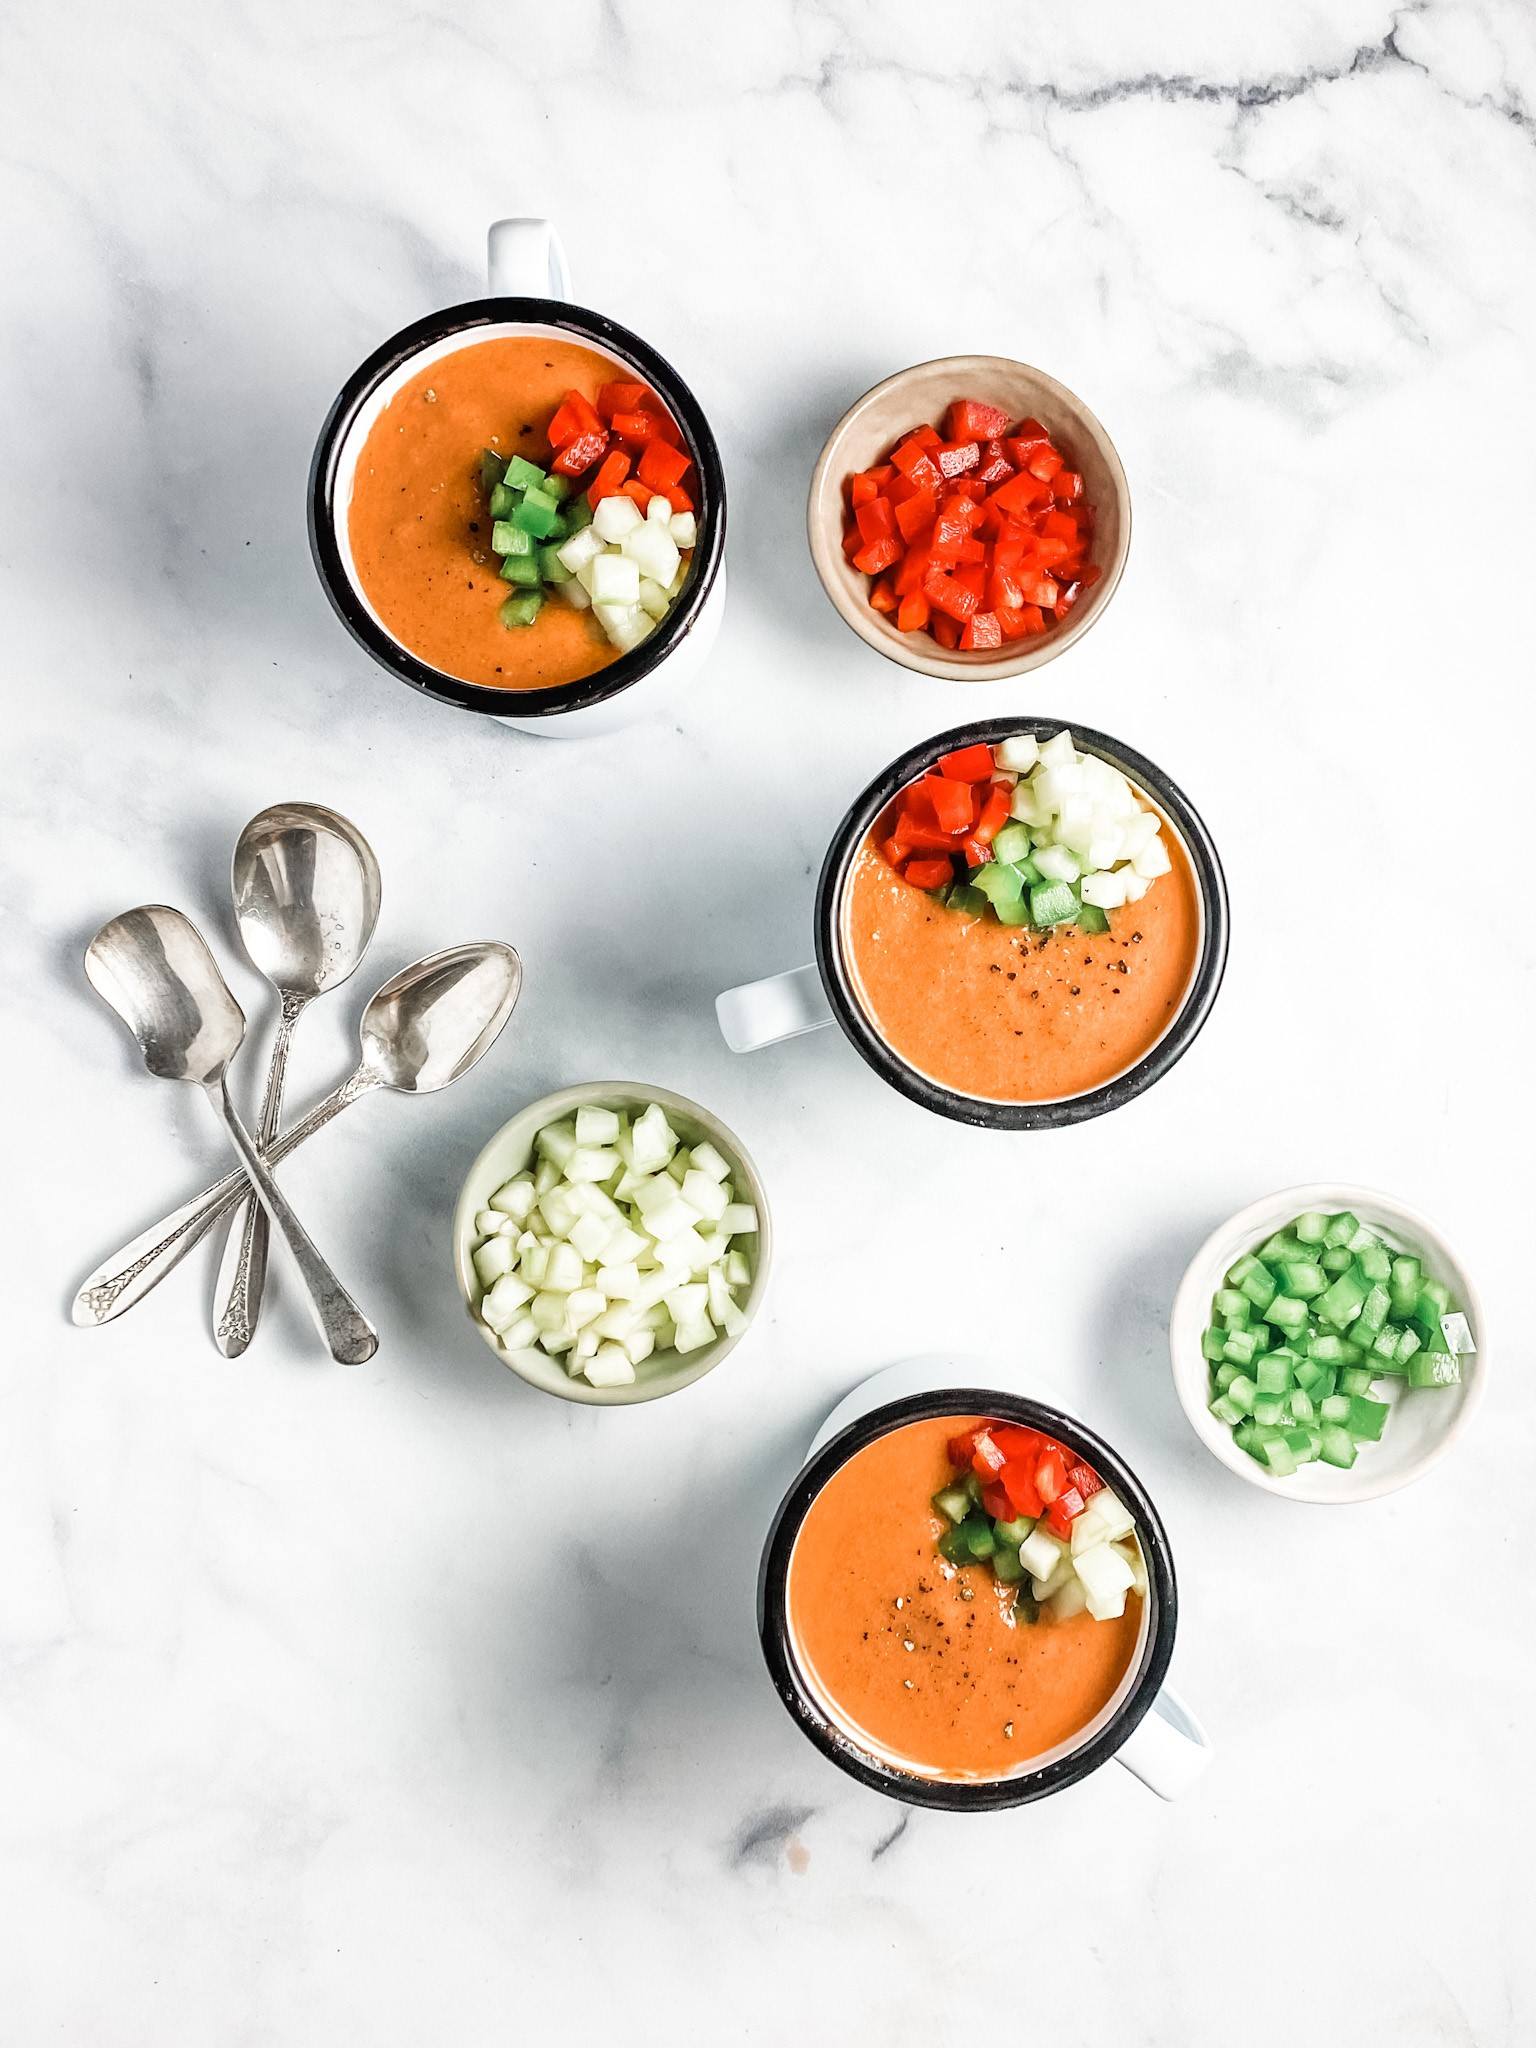 Pregistry's Friday Recipe: Gazpacho